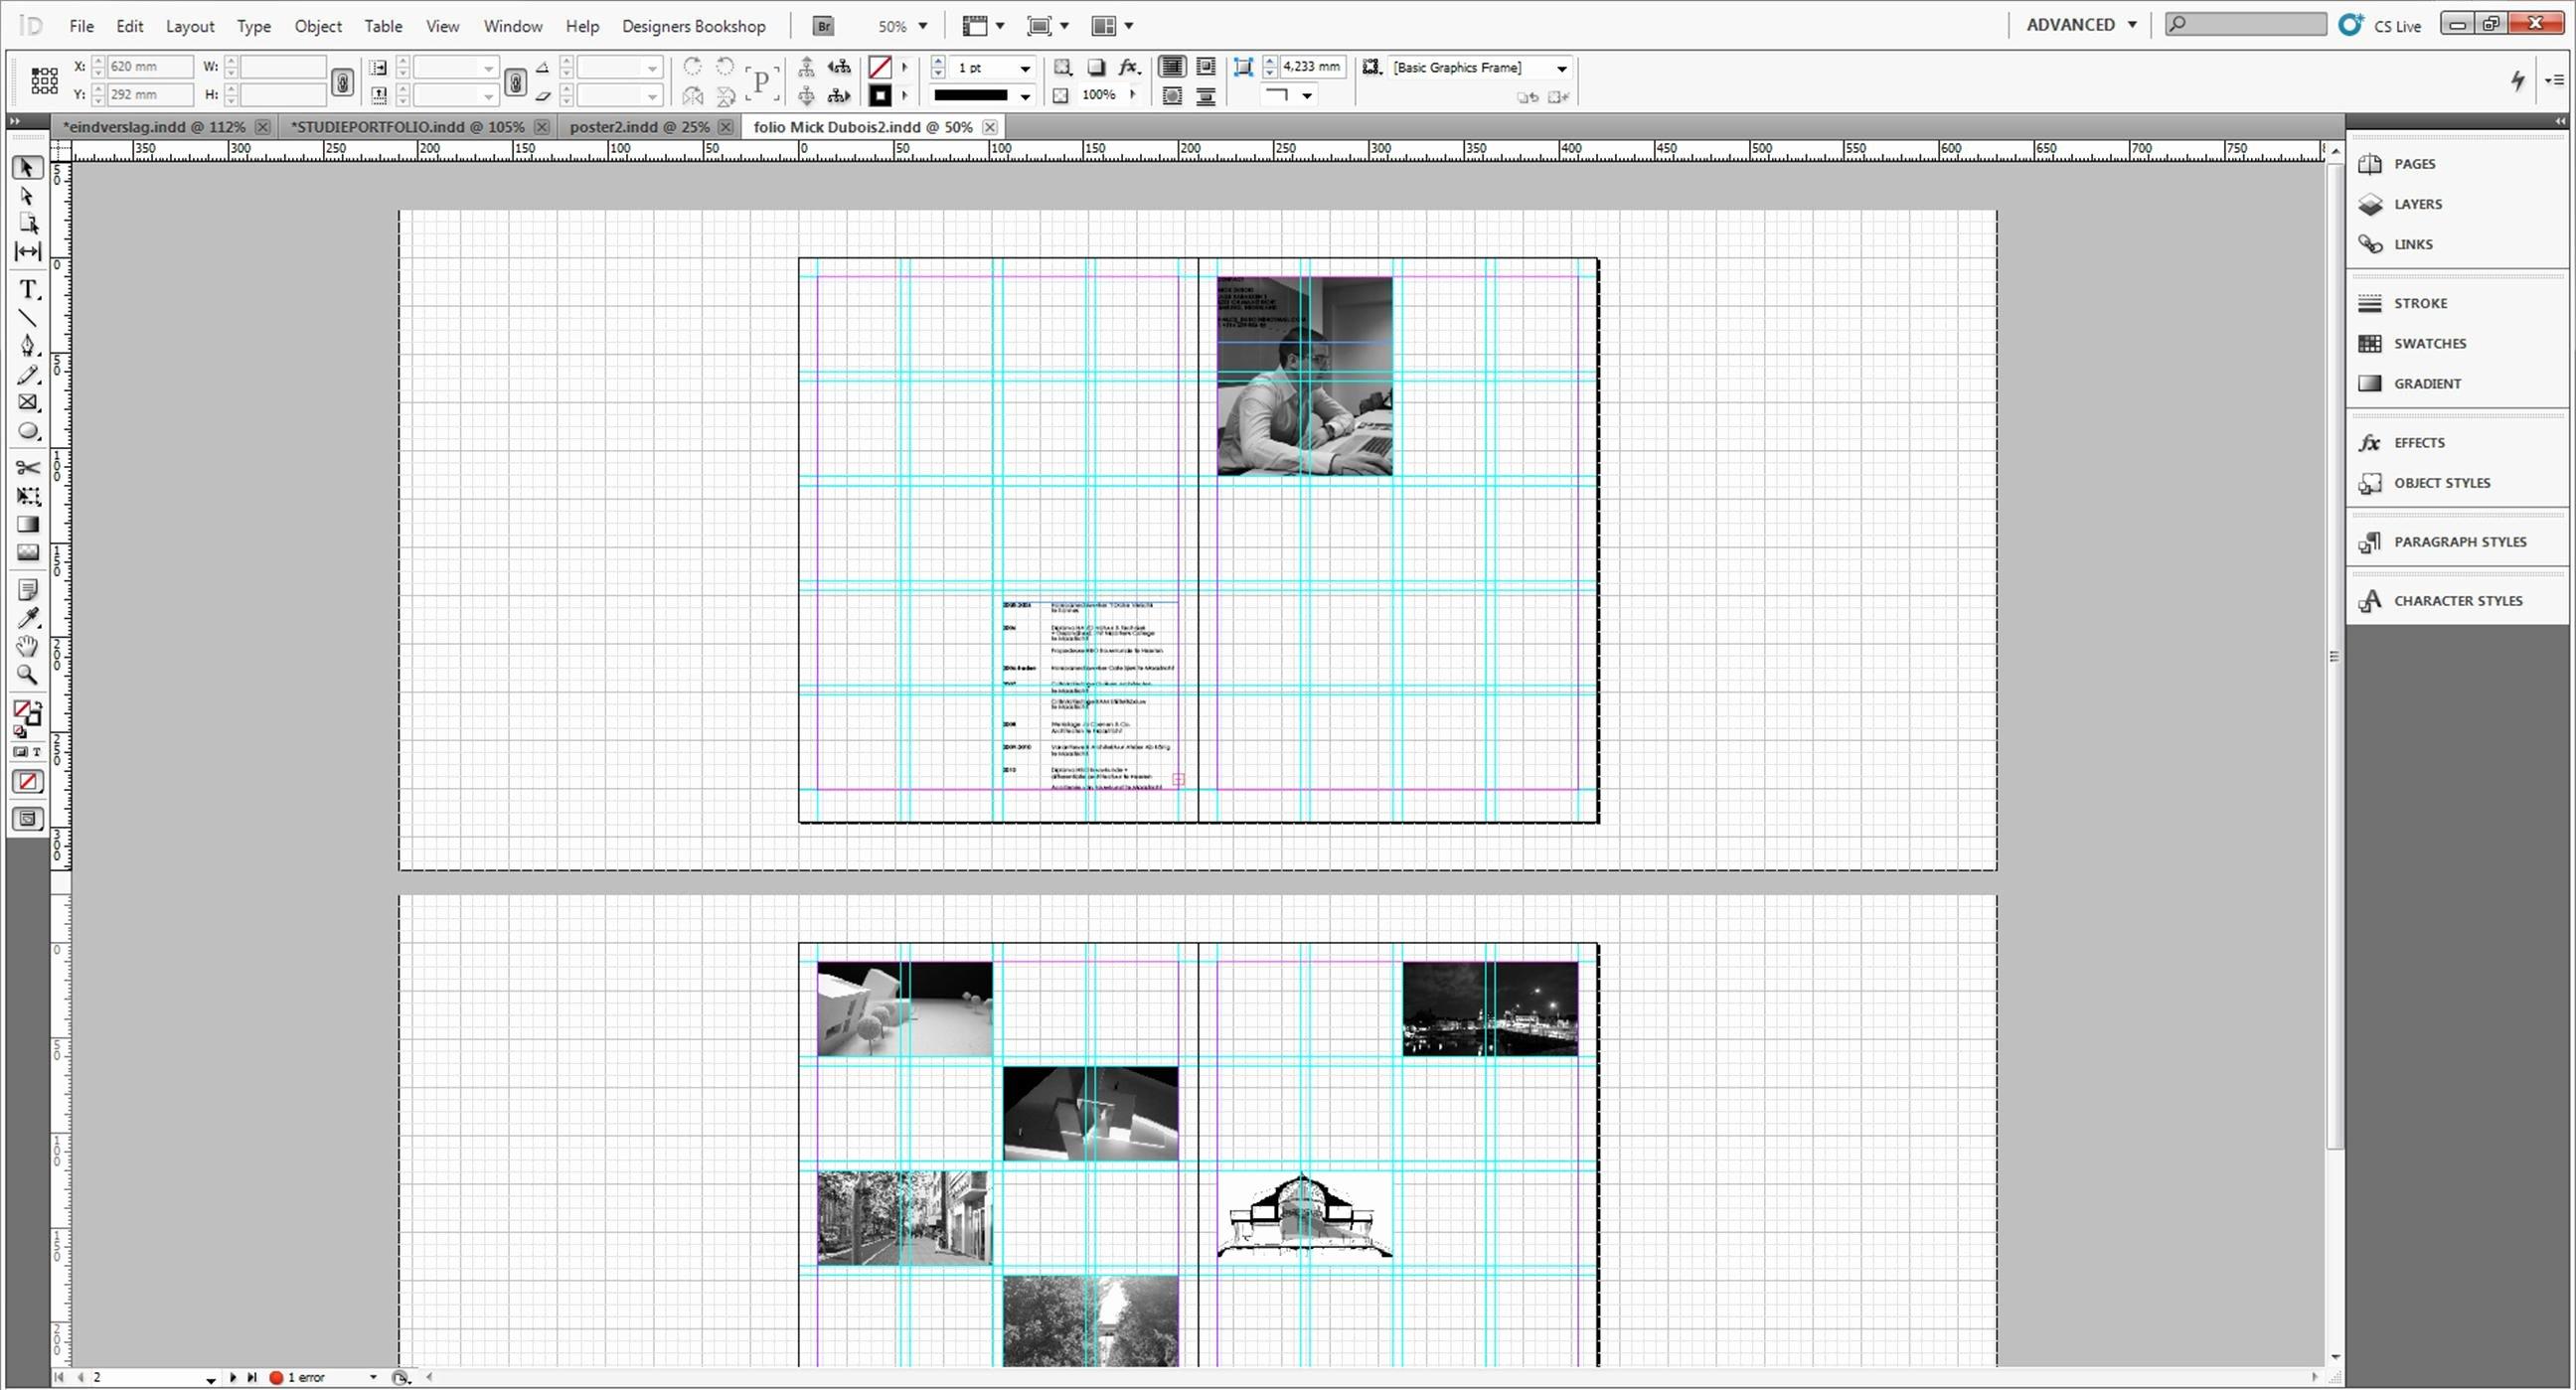 Architecture Portfolio Template Indesign Unique Layout Design Gallery Category Page 2 Designtos